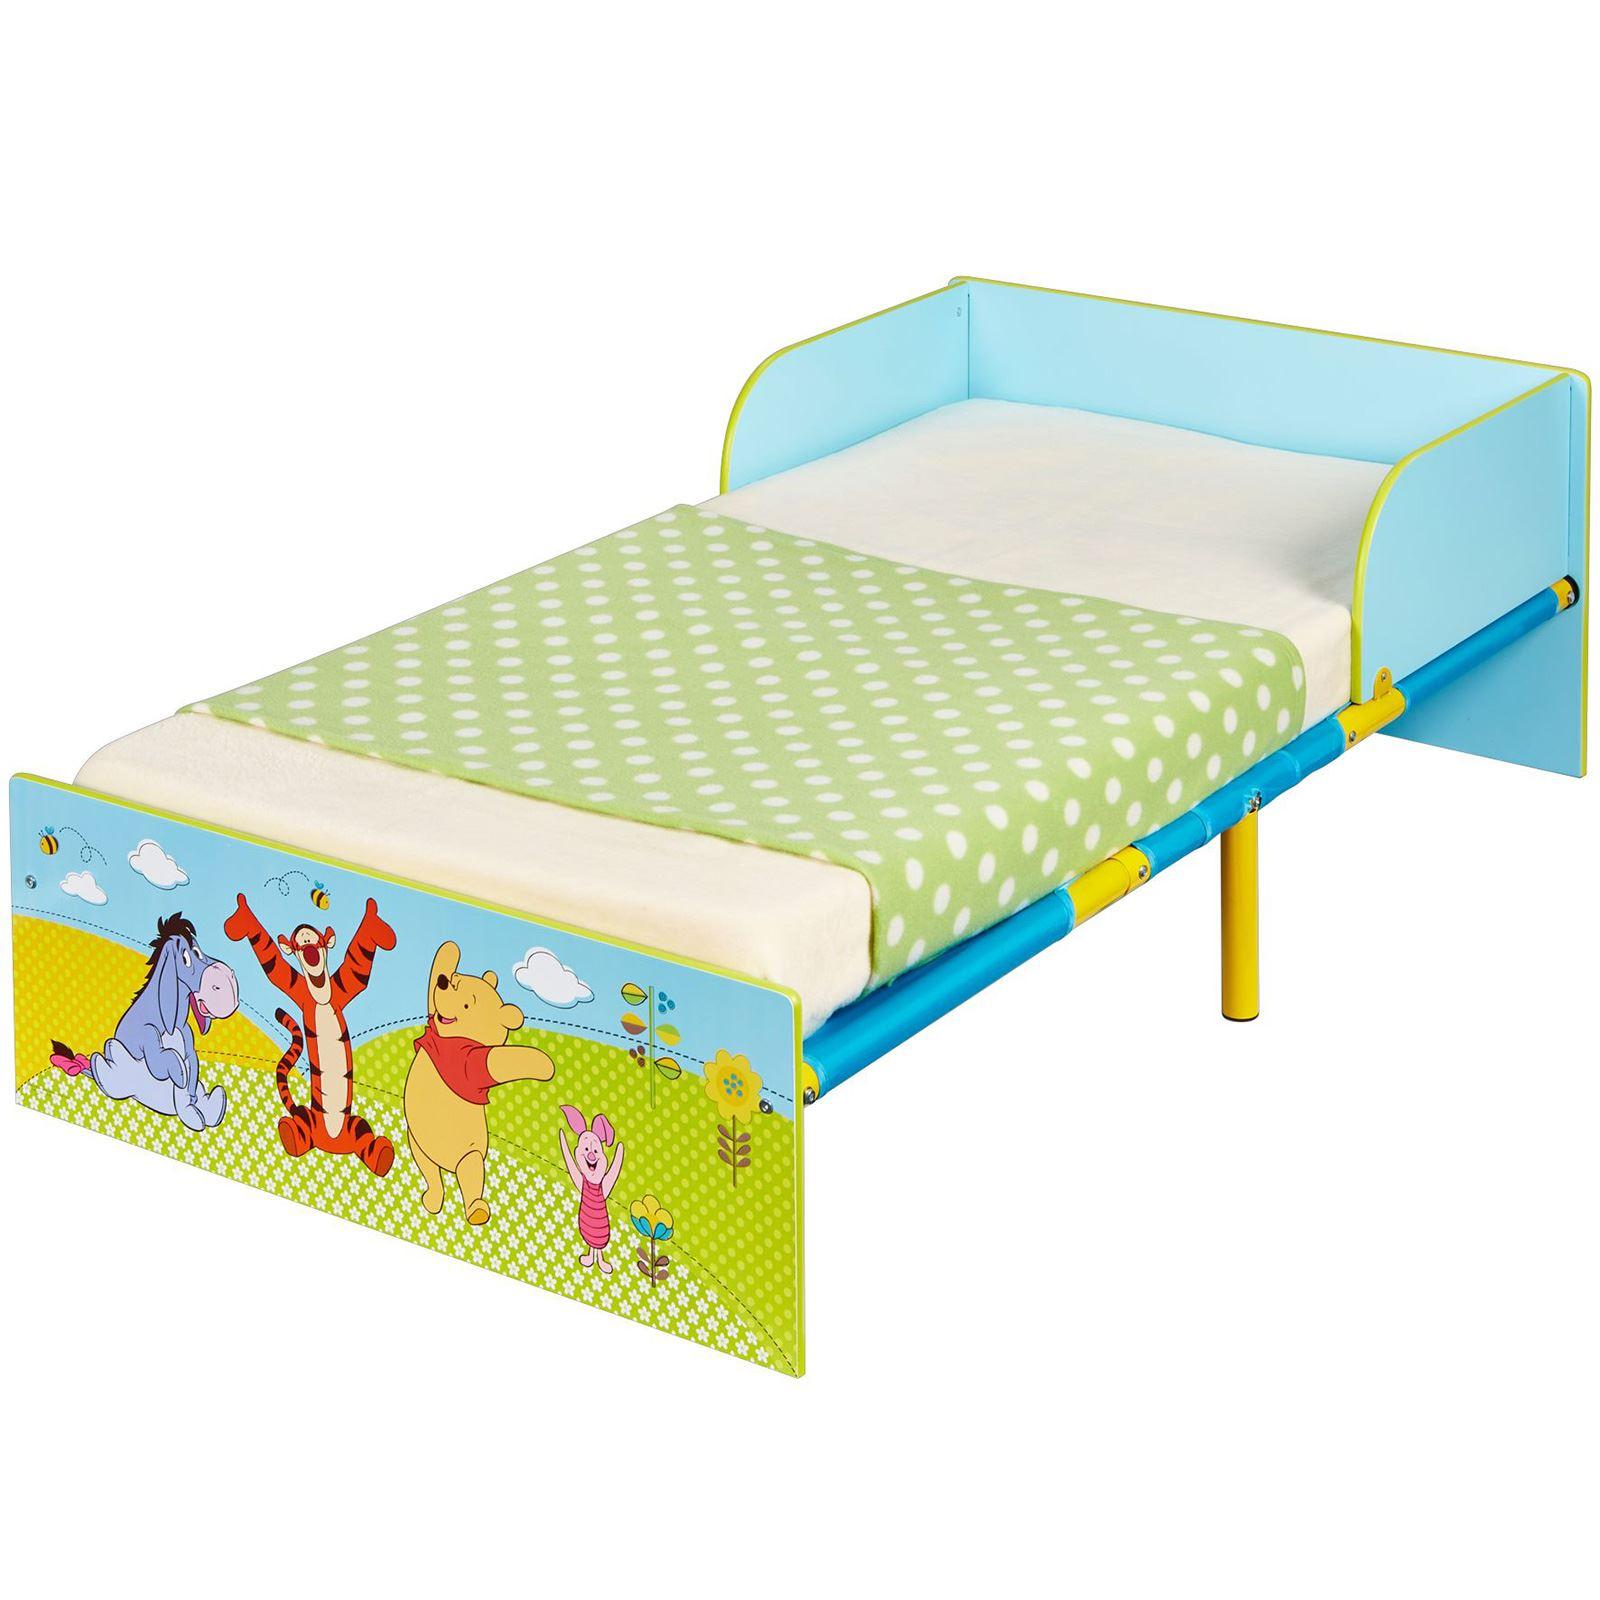 miniatura 54 - KIDS CHARACTER TODDLER BEDS - BOYS GIRLS BEDROOM DISNEY